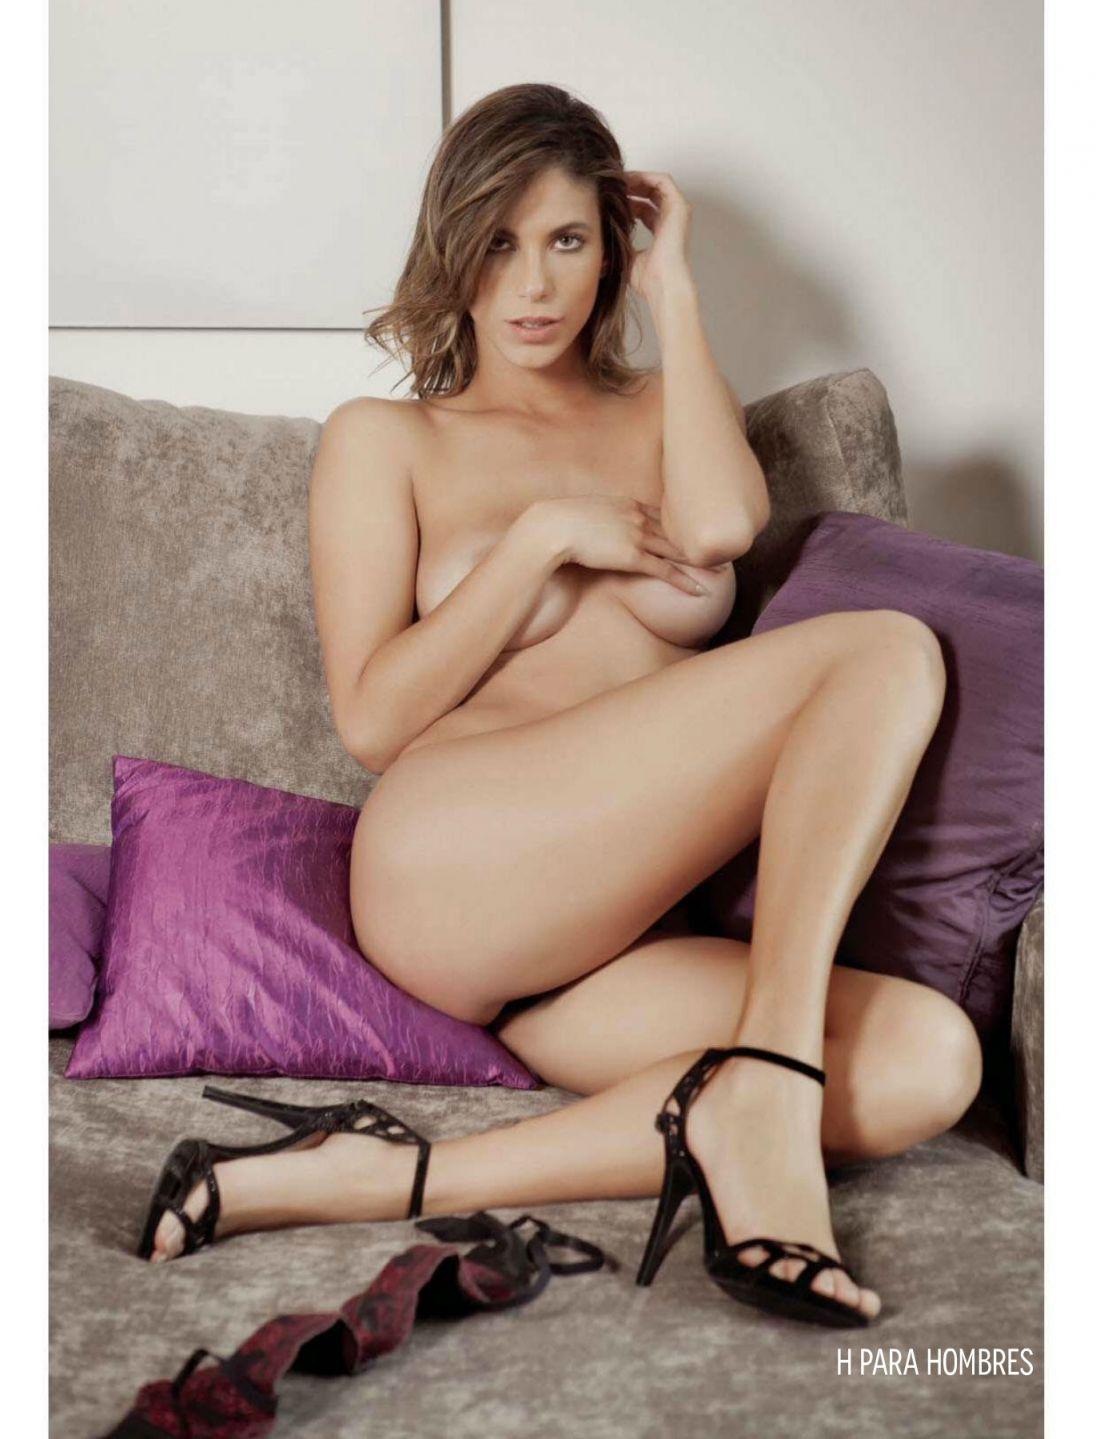 Bruna Goncalves Topless (2 Photos)